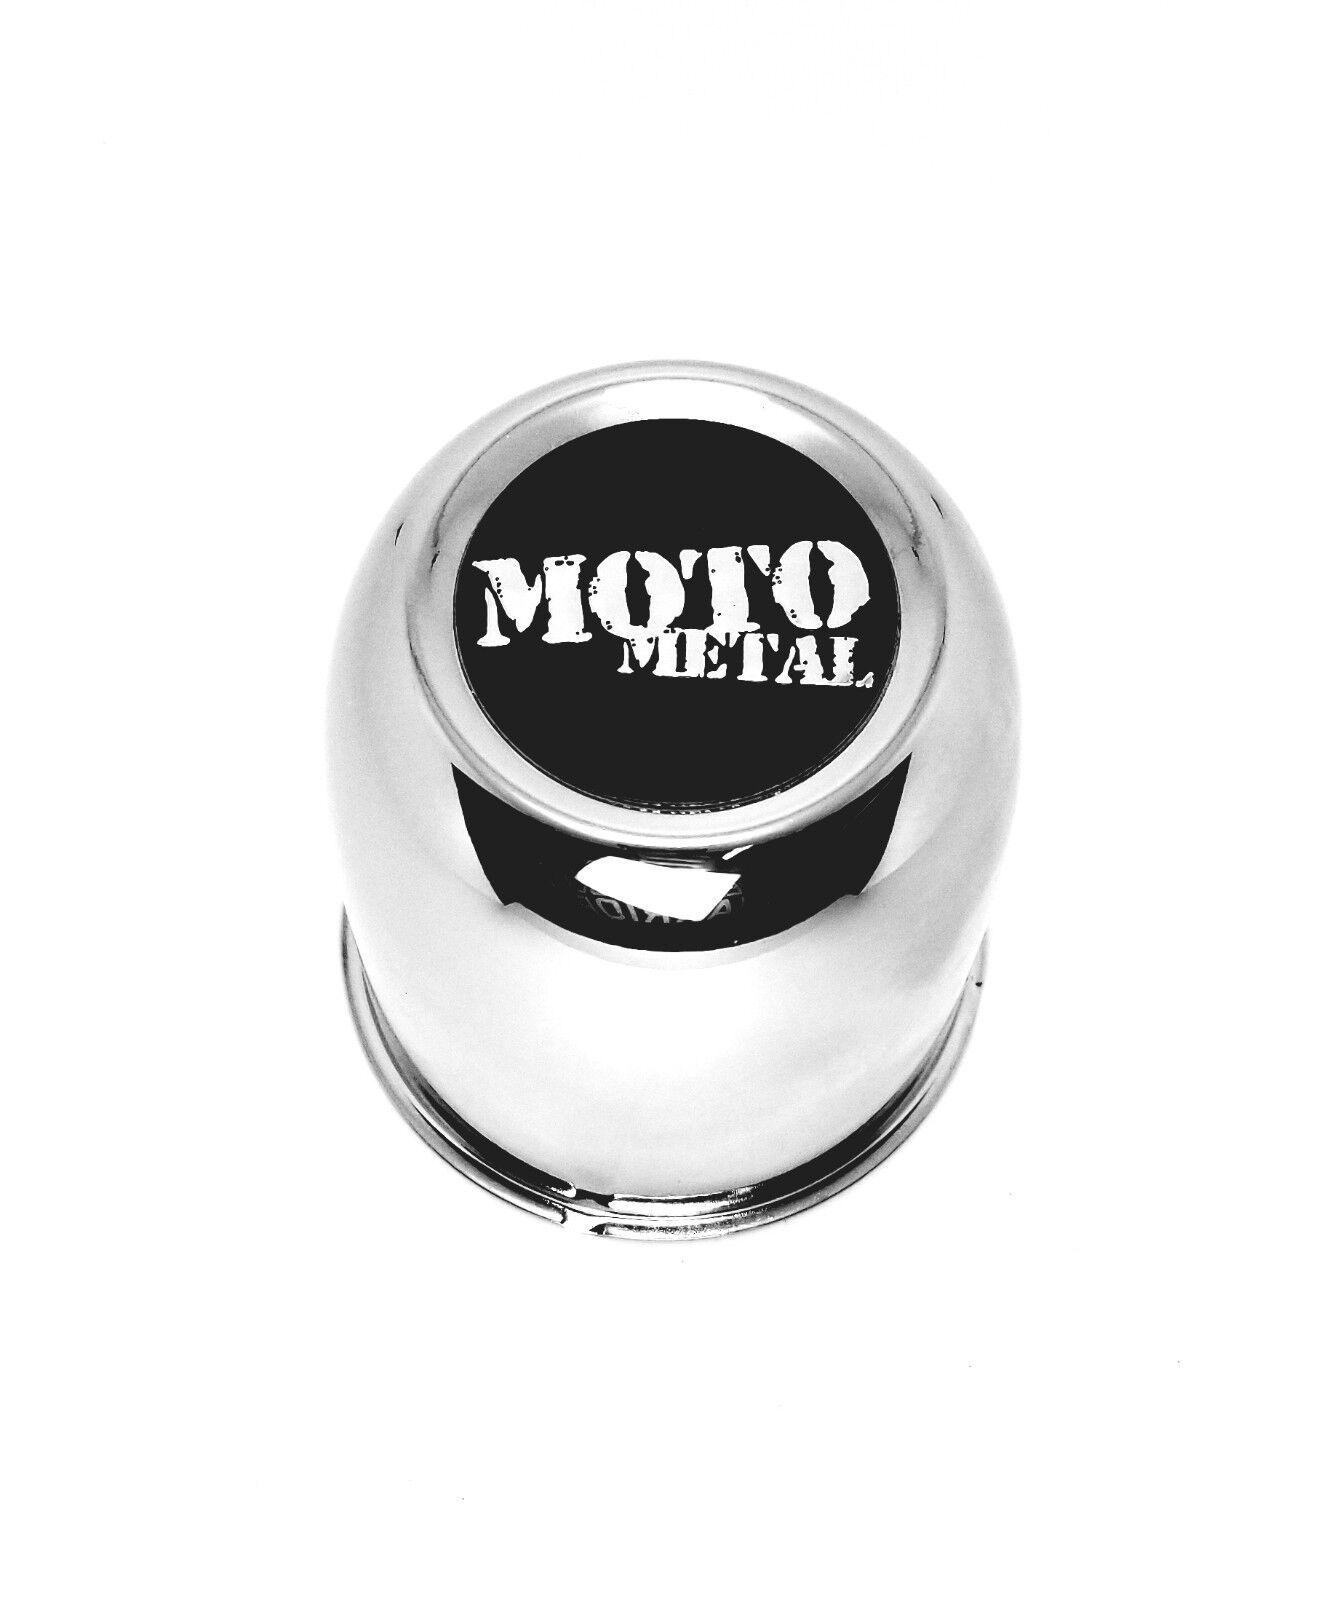 "3.25"" Chrome Push Thru Center Cap Fits 5x4.5 5x5 Wheels C116 w/ Moto Metal Logo"